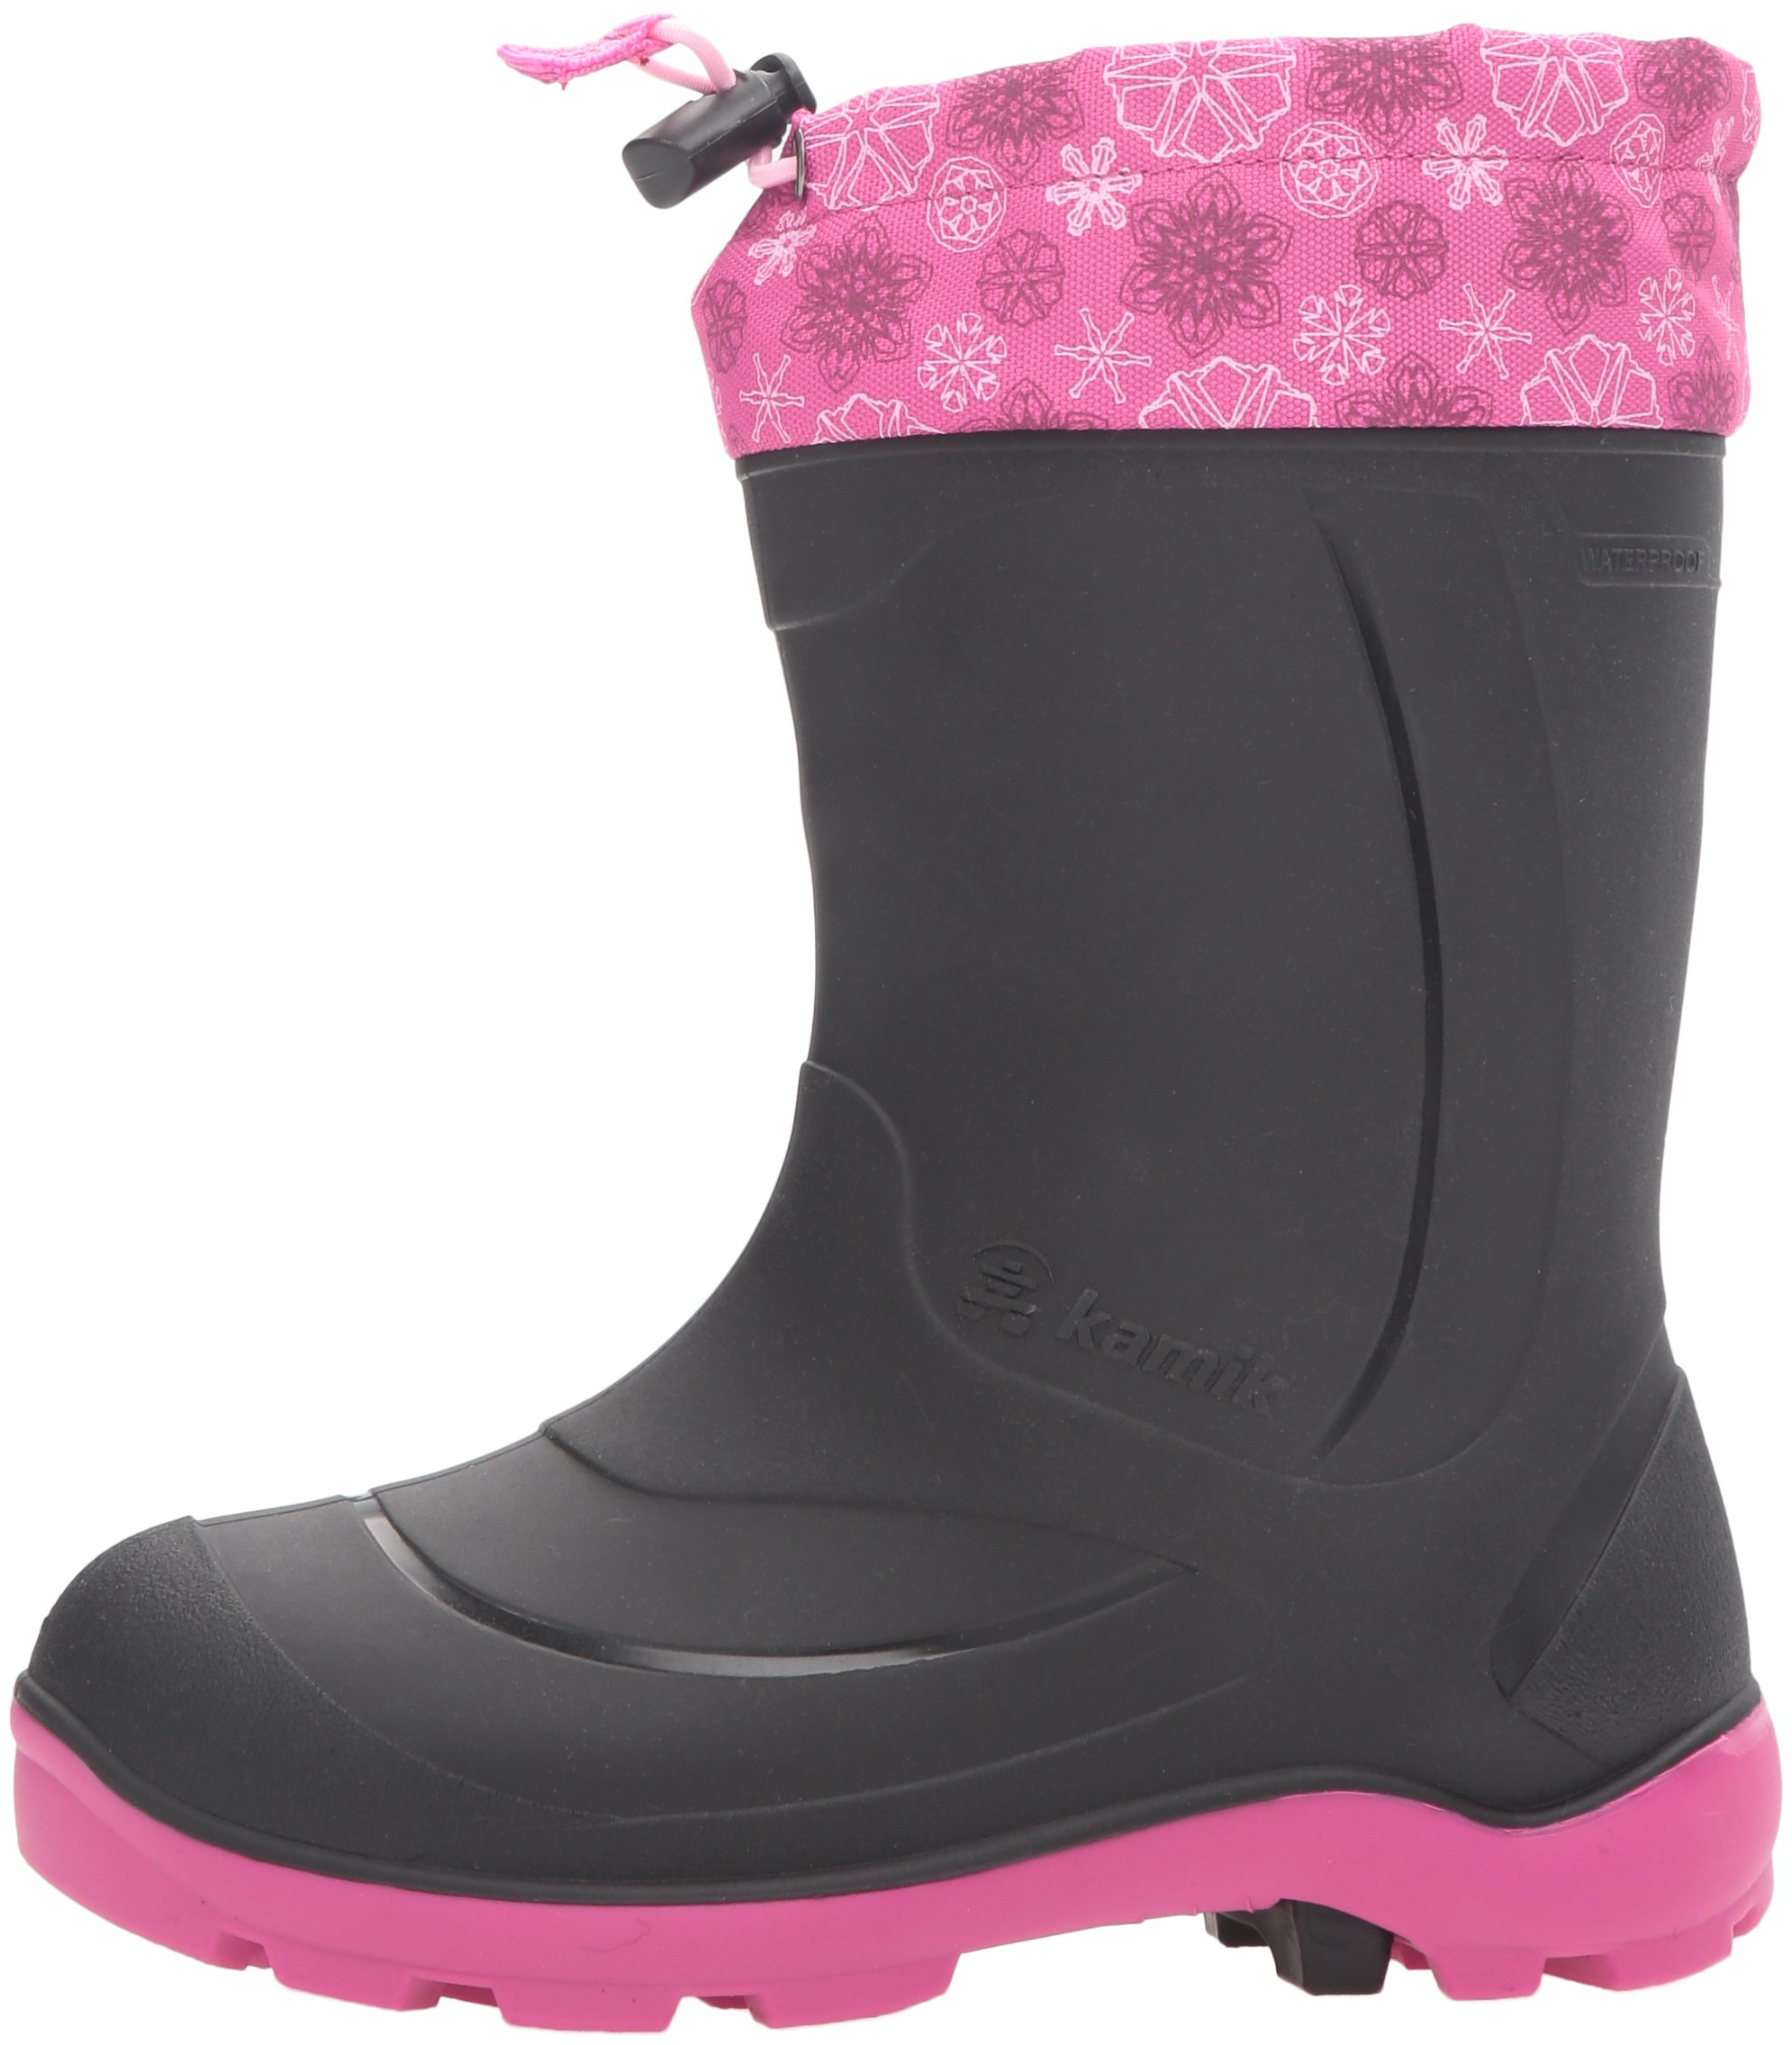 Kamik Kids' Snobuster2 Snow Boot Black/Magenta 9 M US Toddler by Kamik (Image #5)